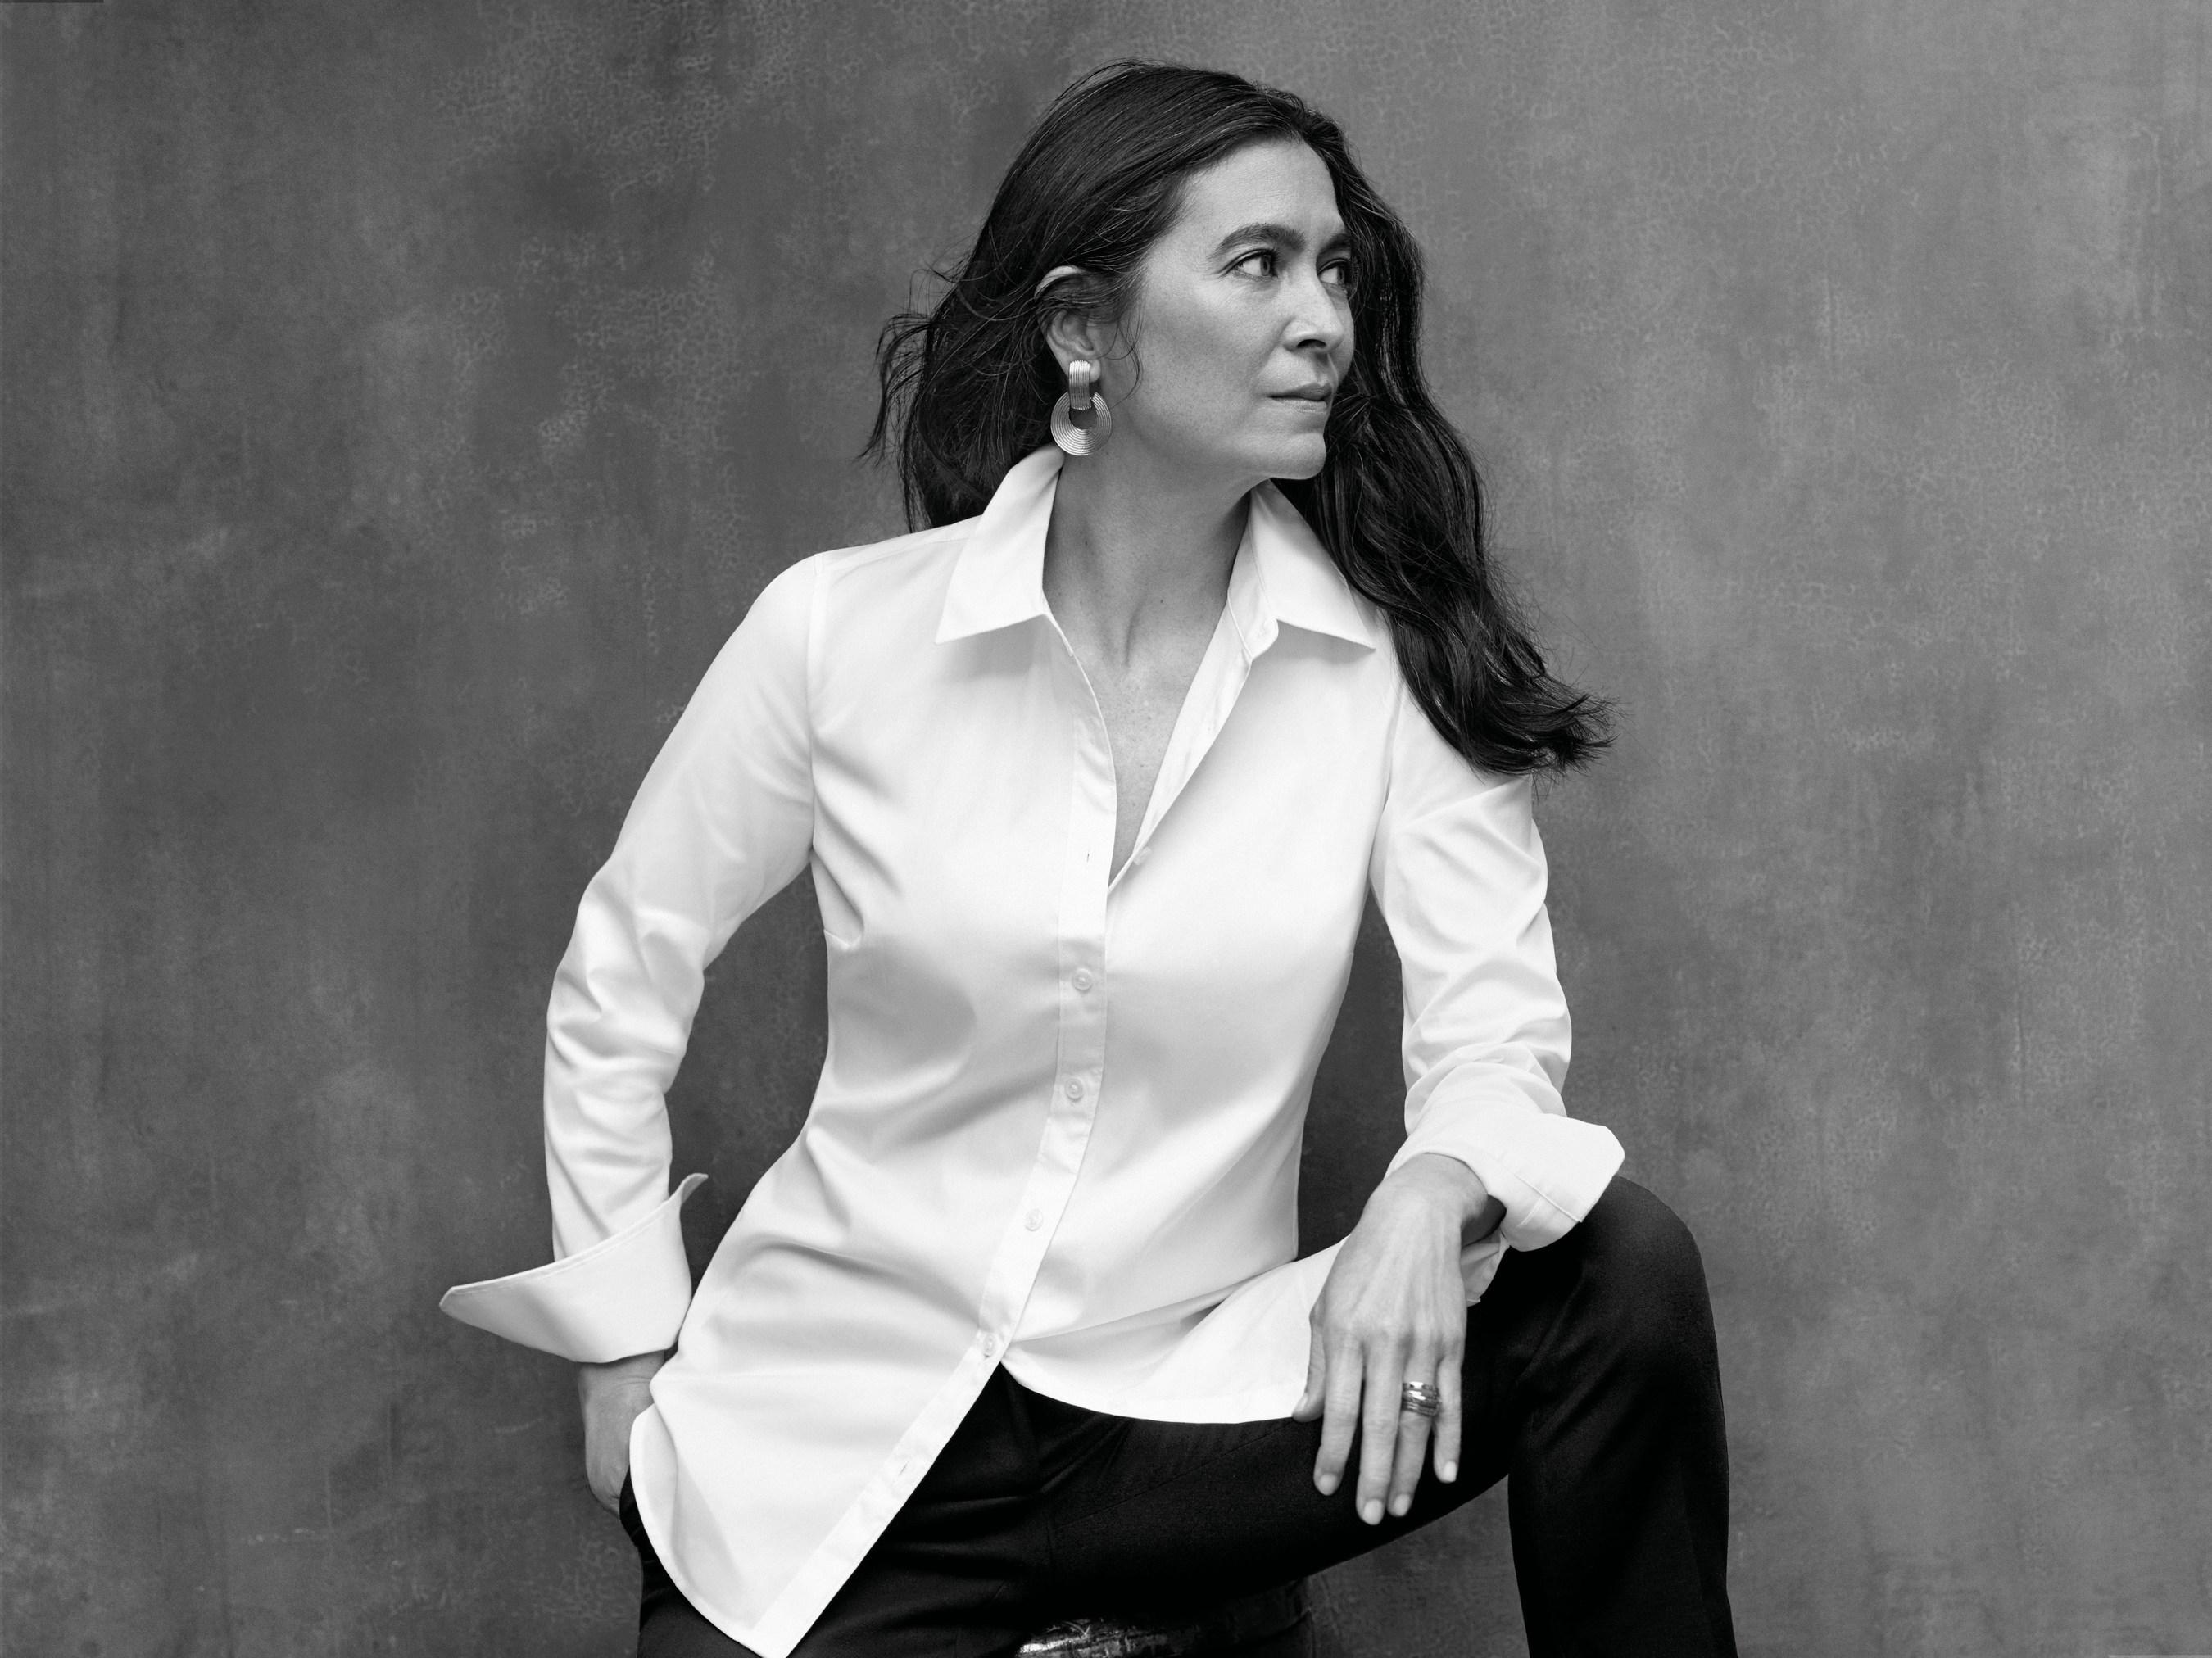 Diane Paulus, director of Broadway's Waitress